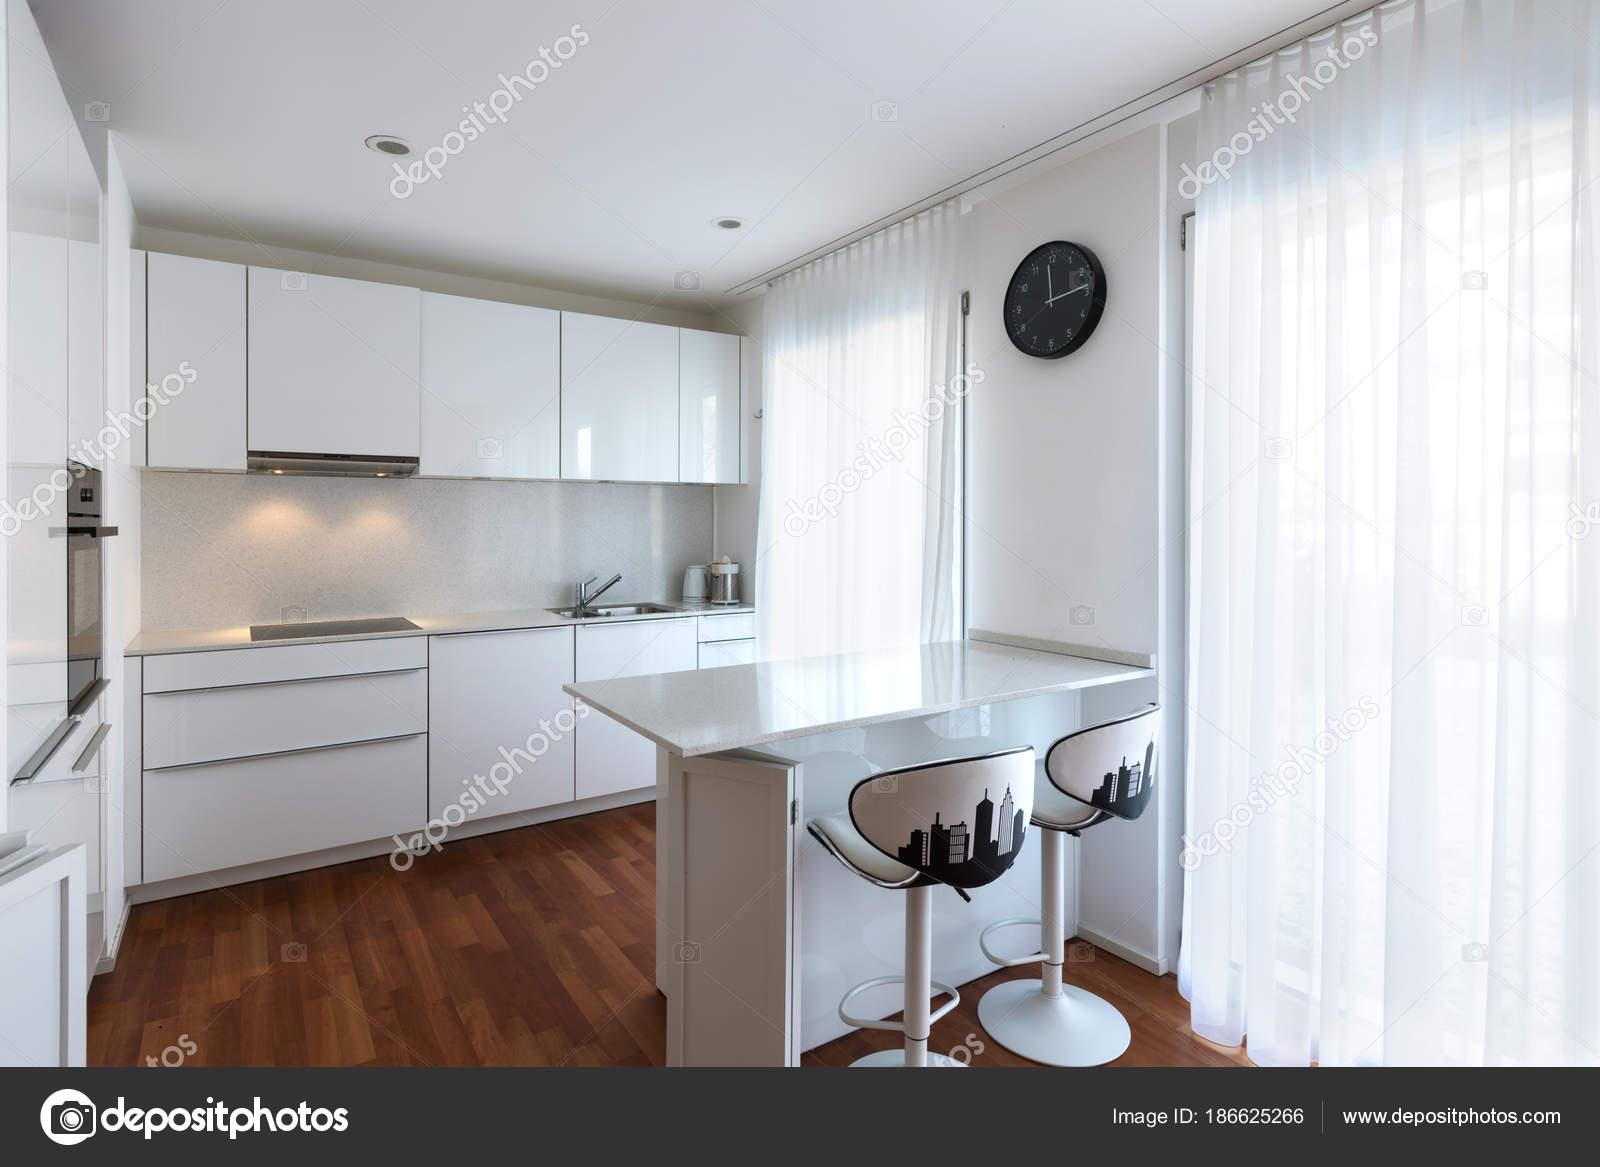 Keuken Schiereiland Met : Budgetkeuken moderne hoek keuken met schiereiland